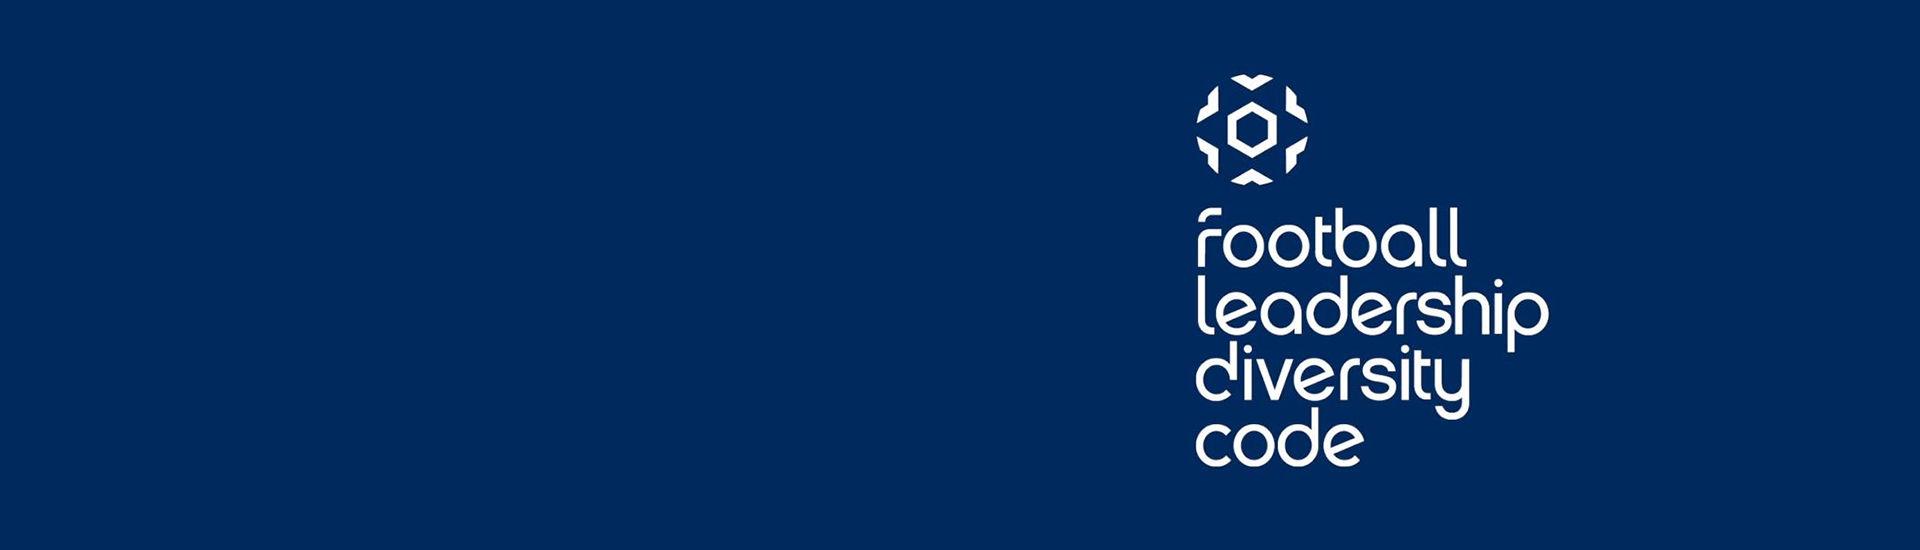 FA launches Football Leadership Diversity Code